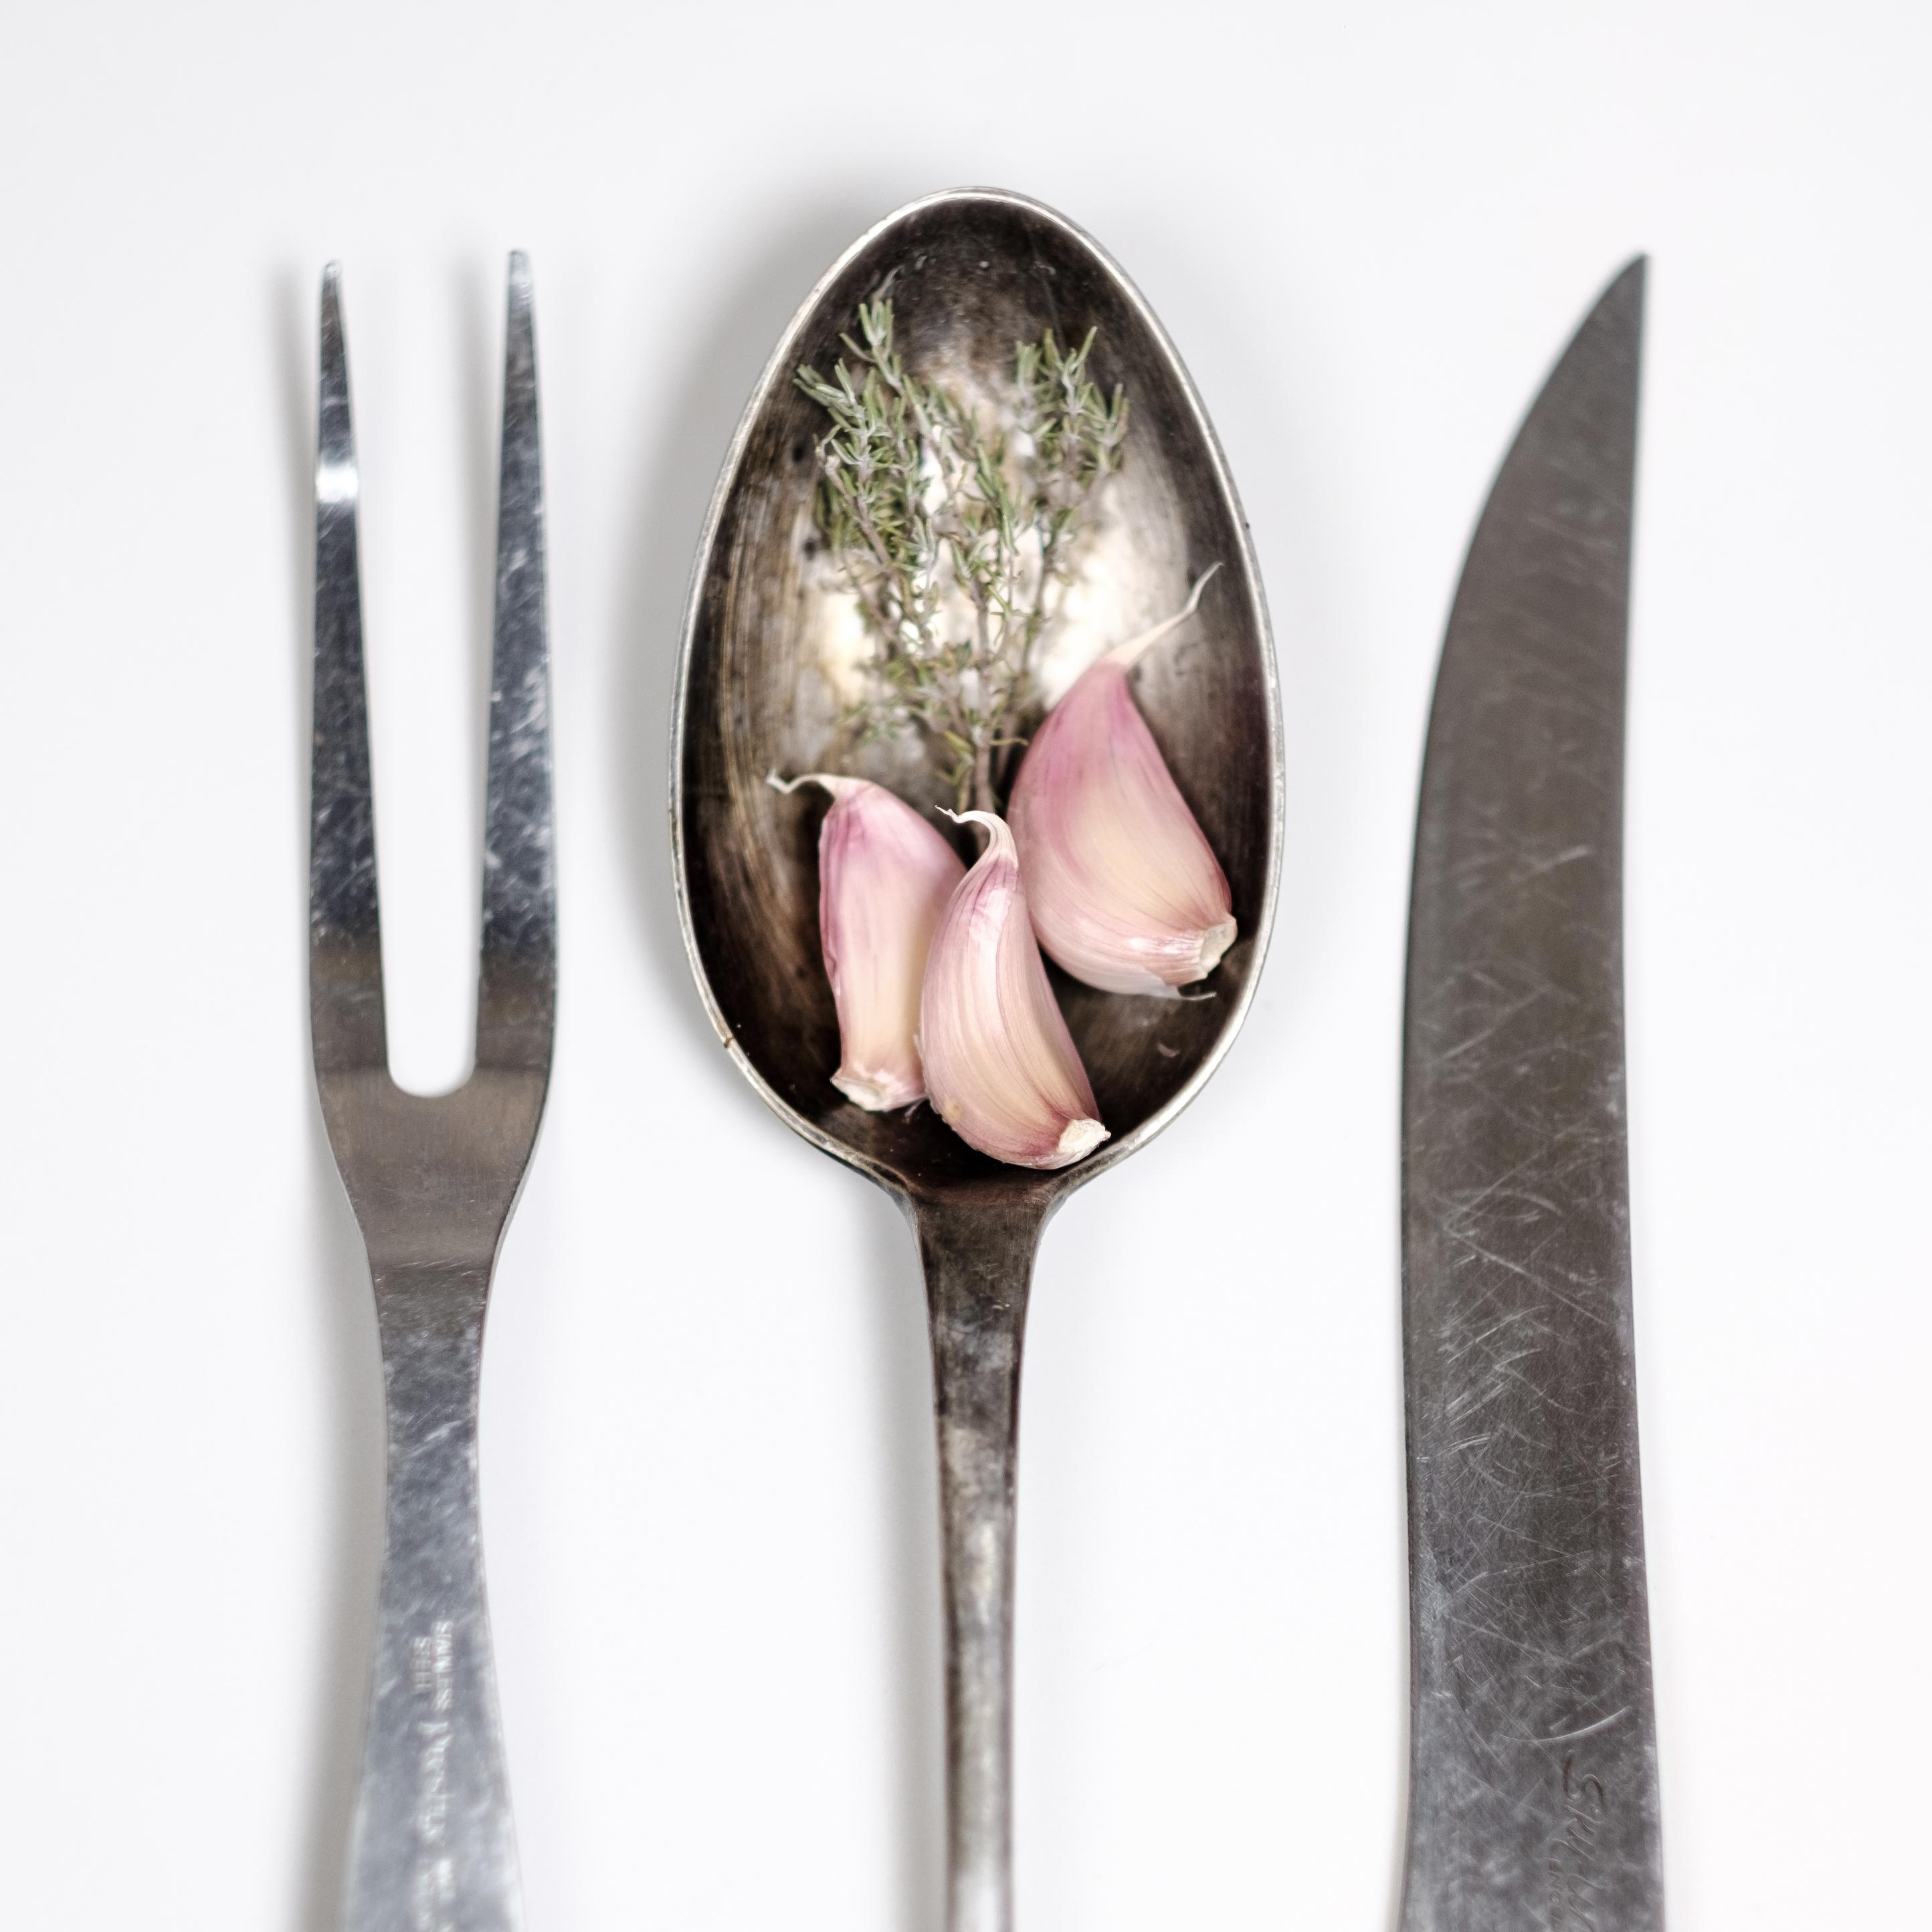 spoon bulb3.jpg